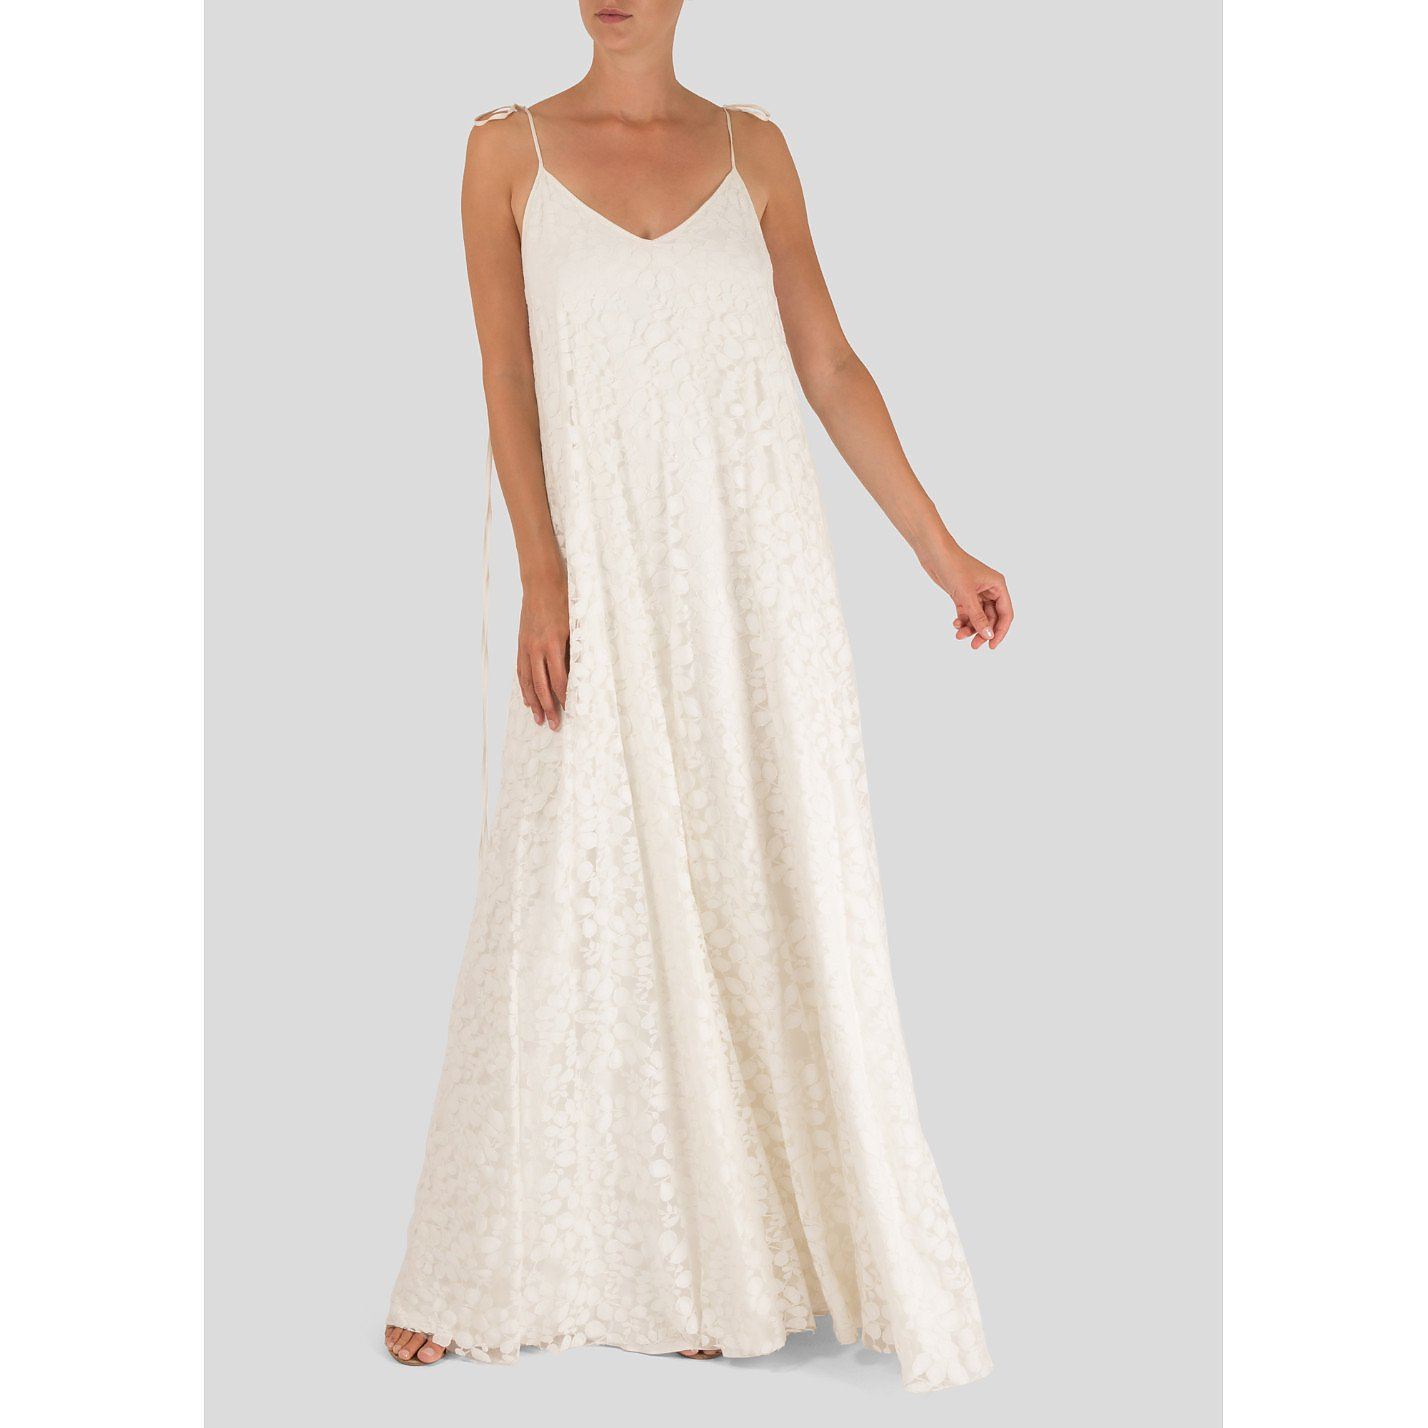 Charlie Brear Beaumont Lace Dress